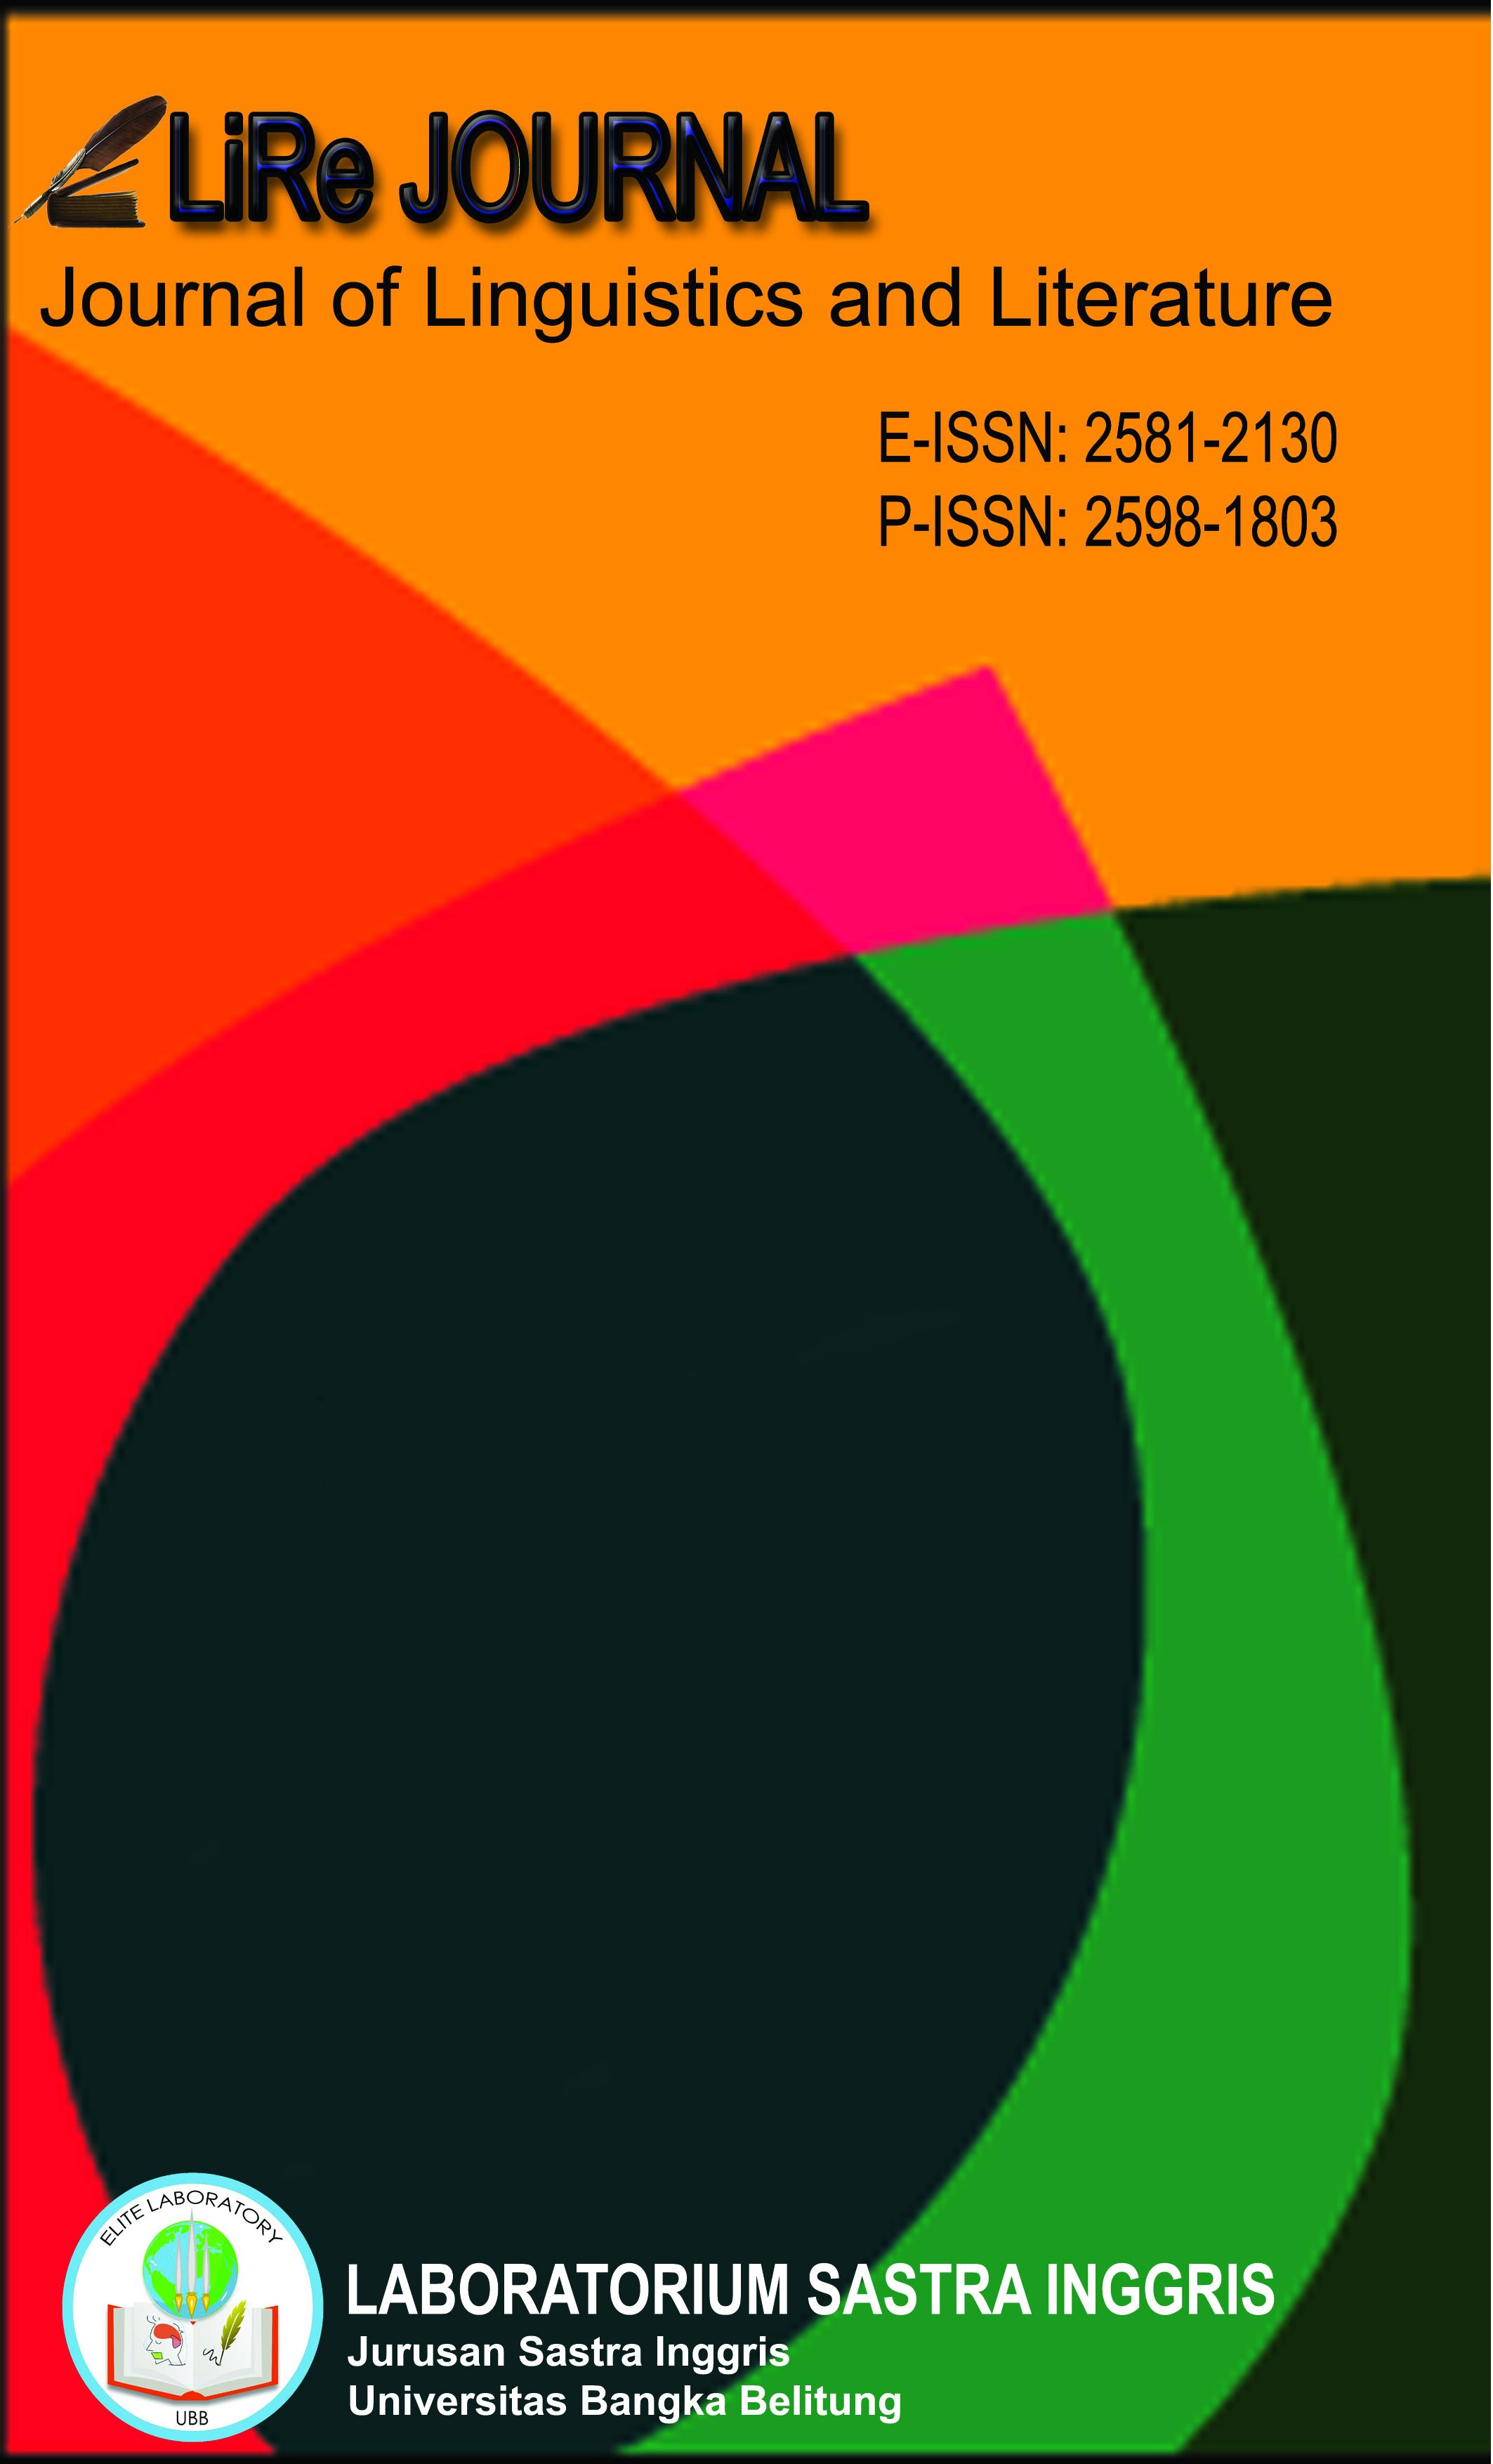 Lire Journal (Journal of Linguistics and Literature)